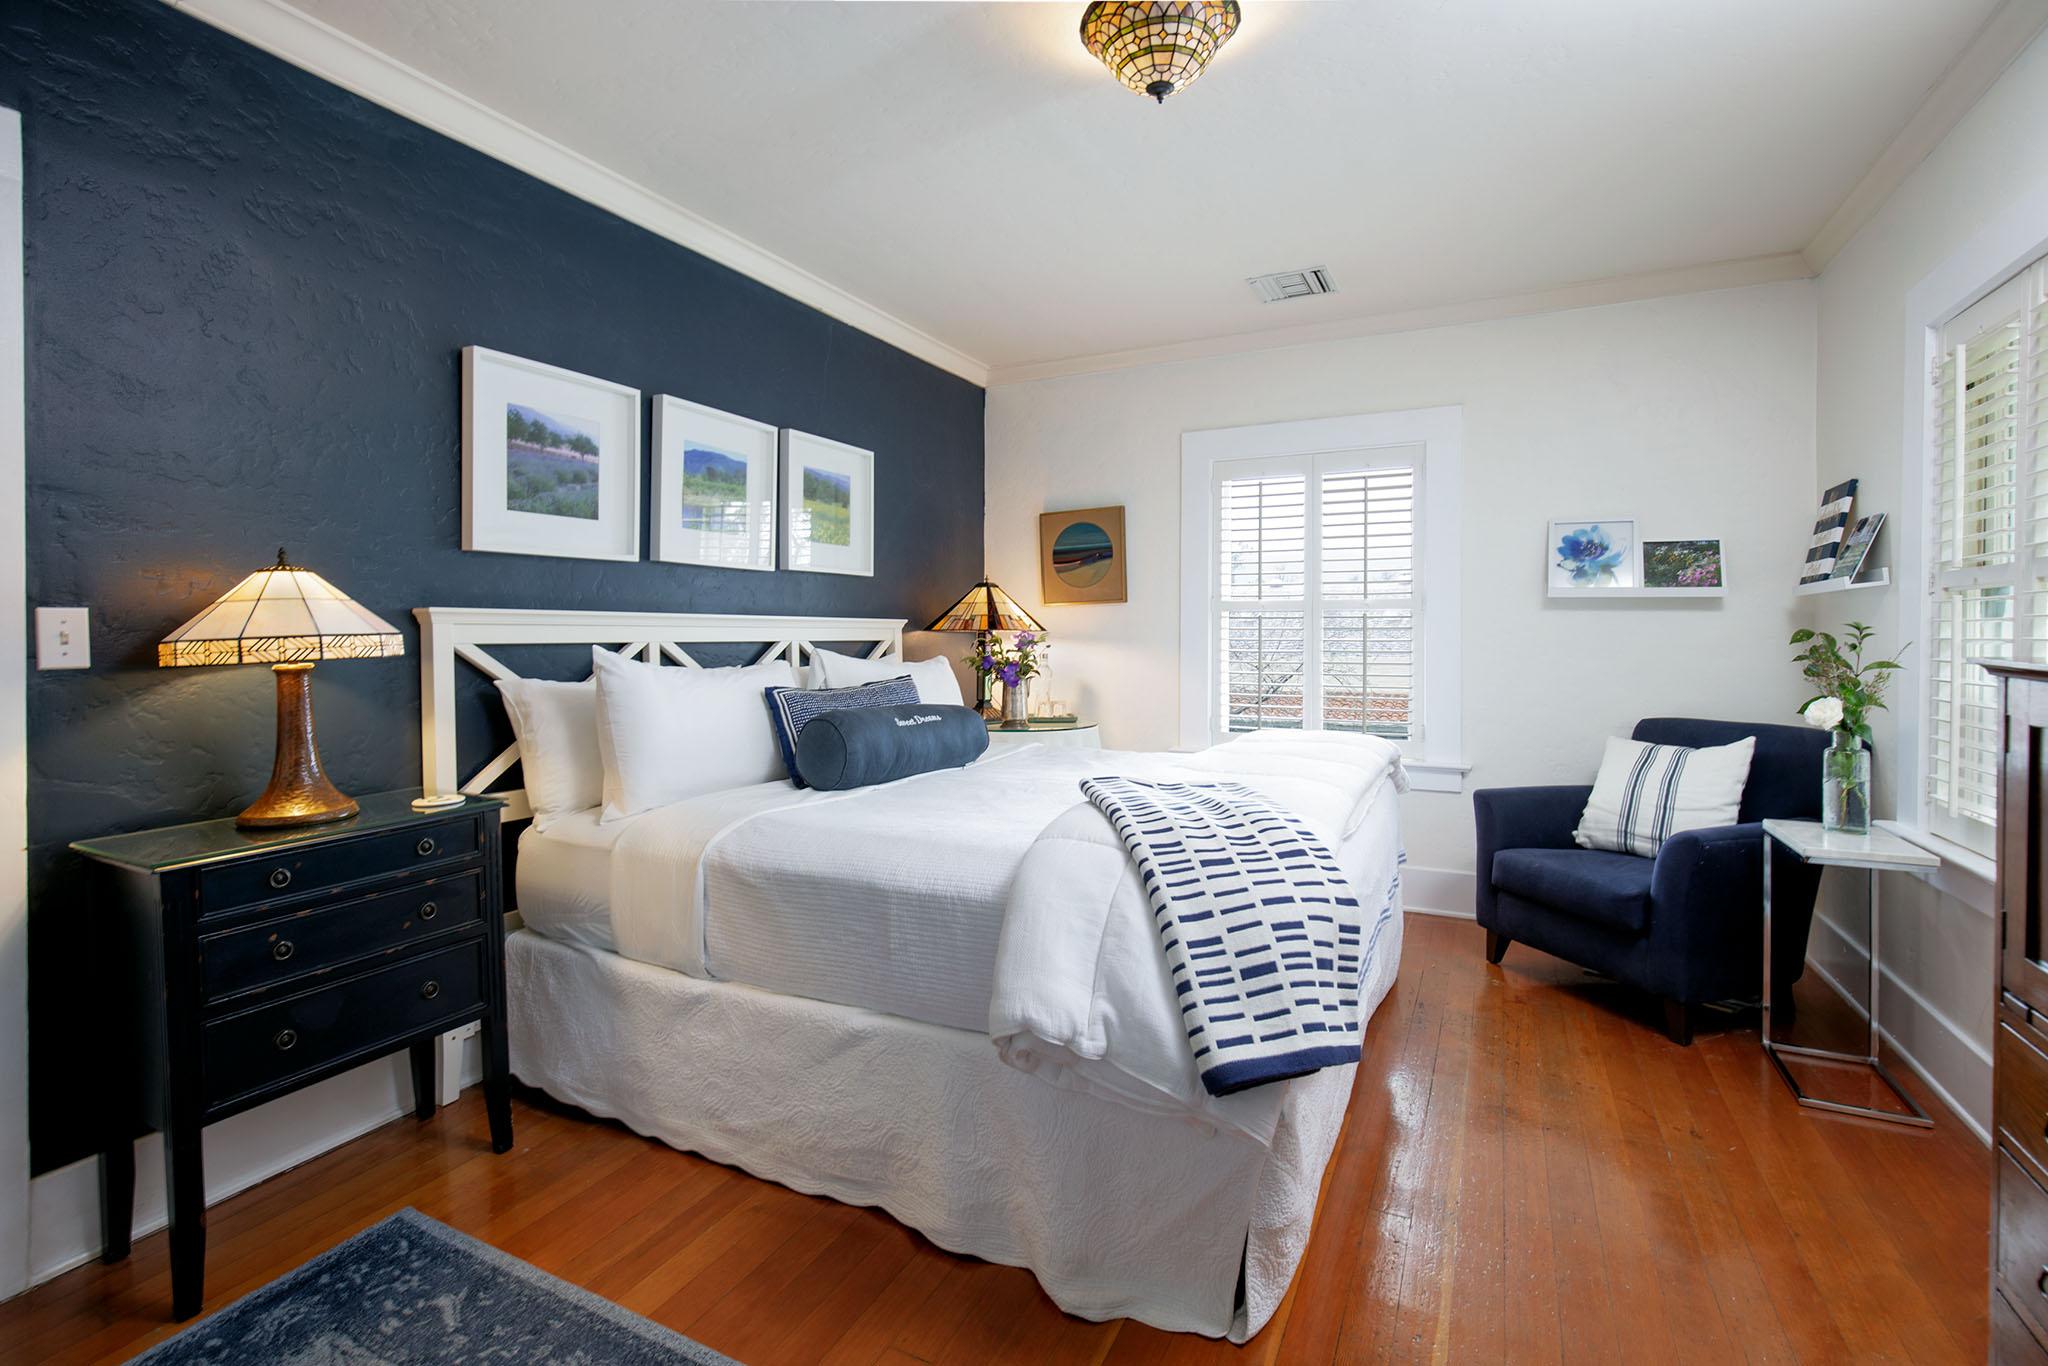 Bed room in Ojai, CA/Lavender Inn, bed and breakfast